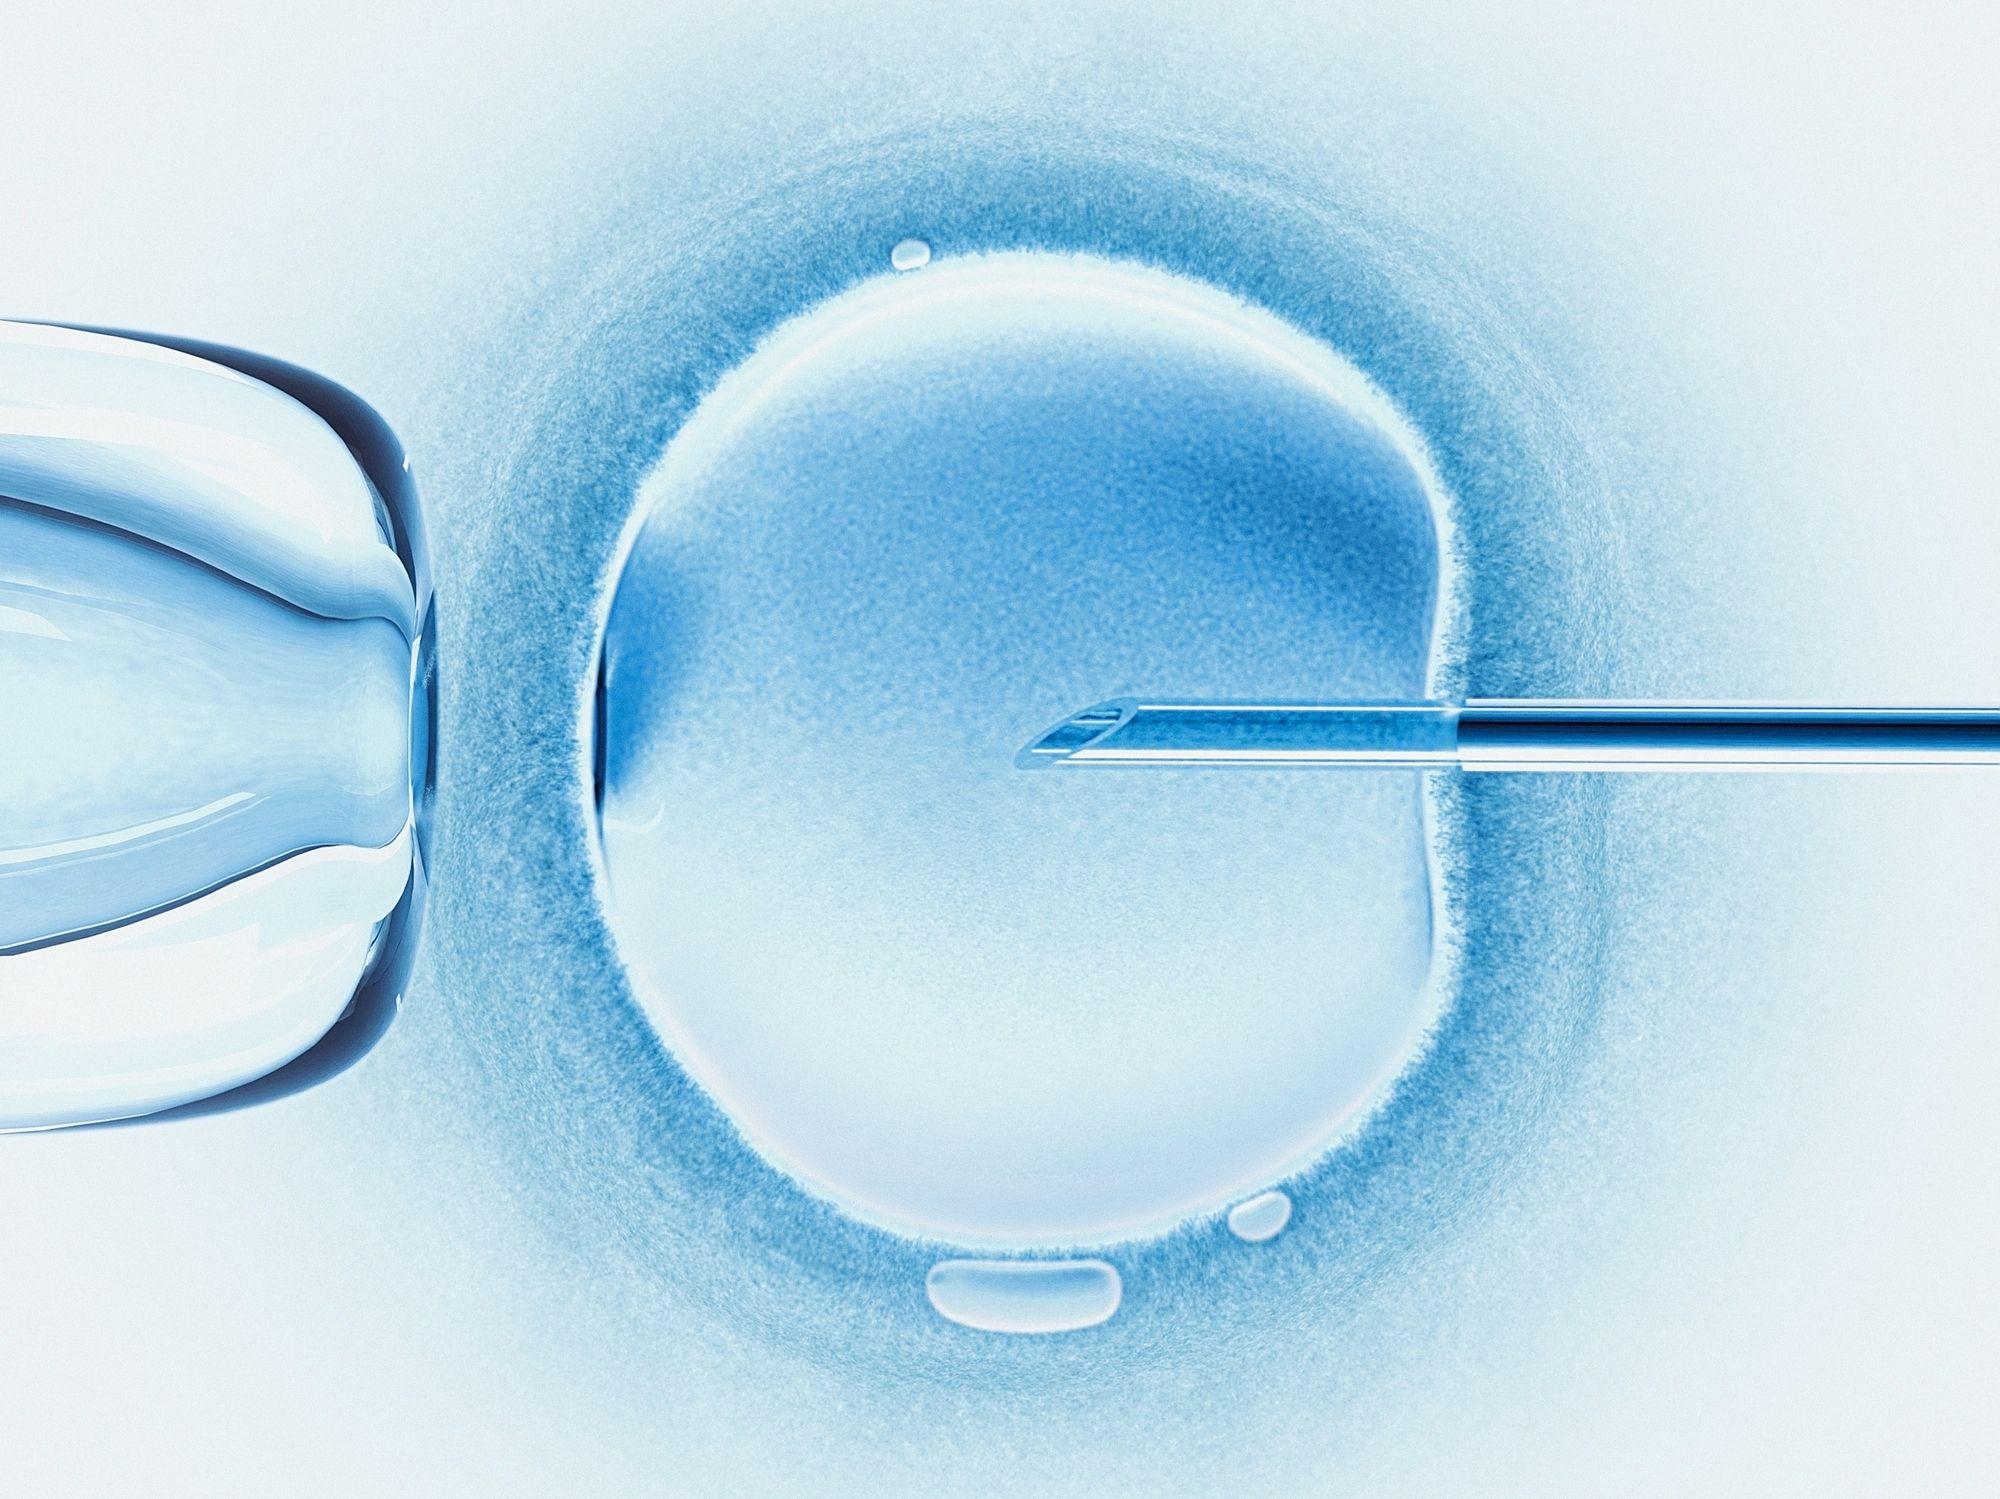 Clinics Retrieving 'Far Too Many' Eggs from IVF Patients